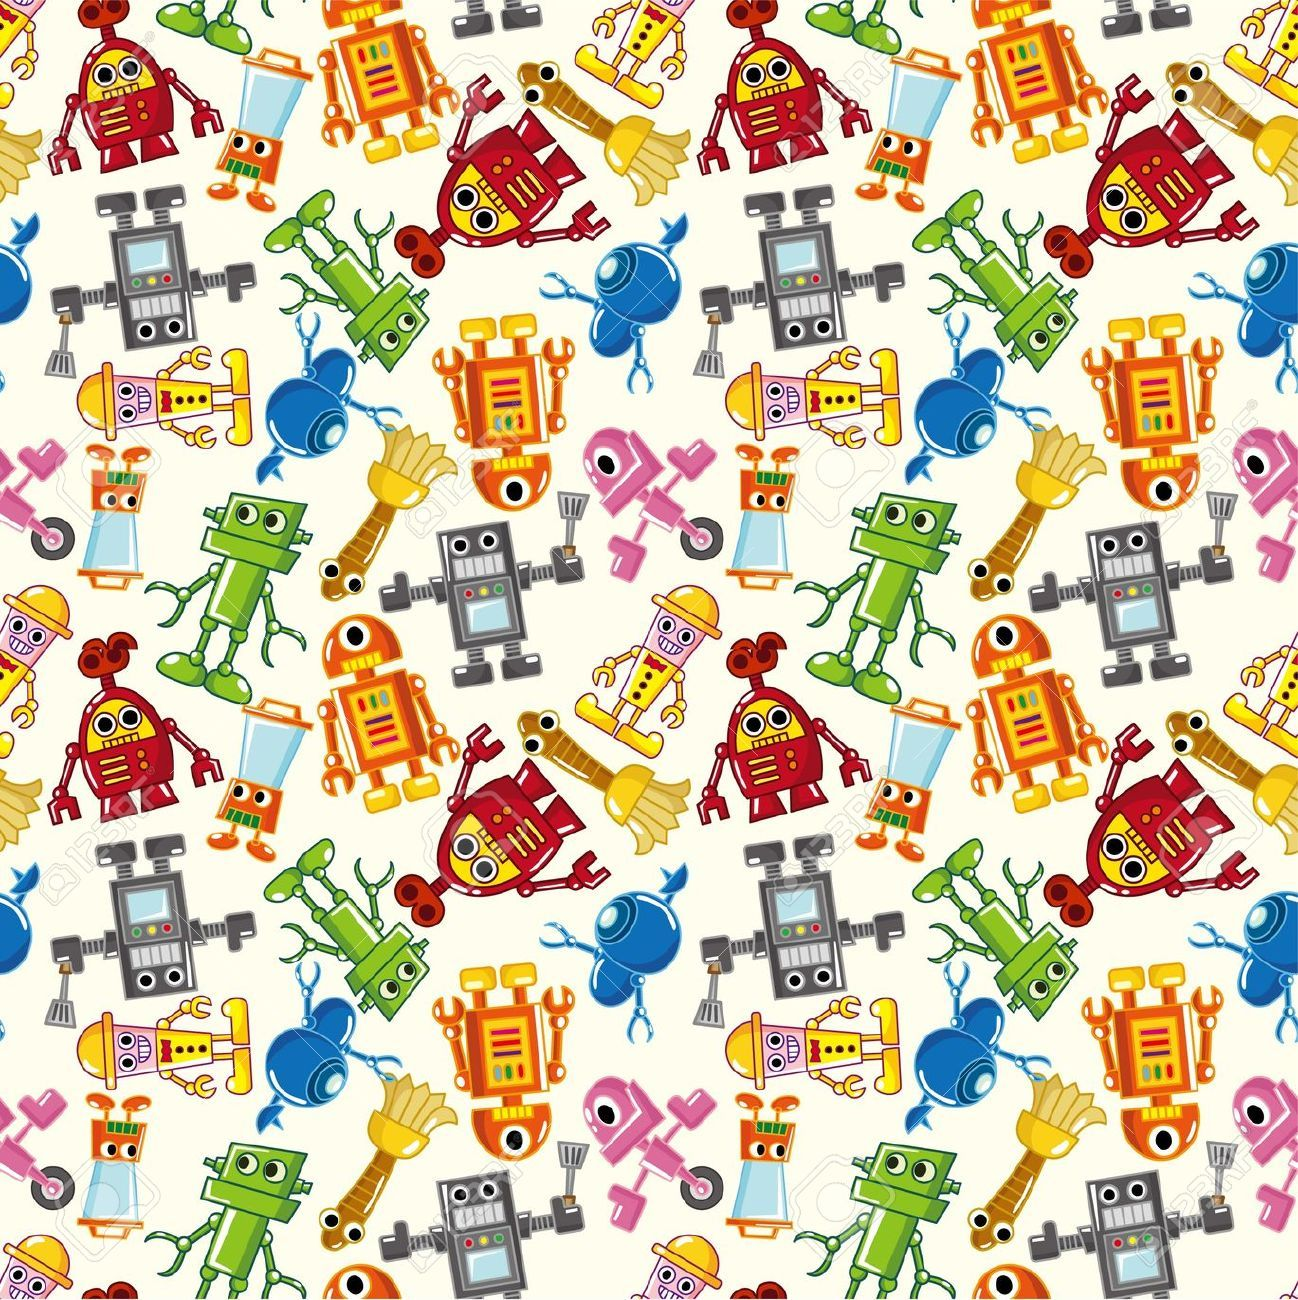 Cartoon Robot Wallpapers Top Free Cartoon Robot Backgrounds Wallpaperaccess